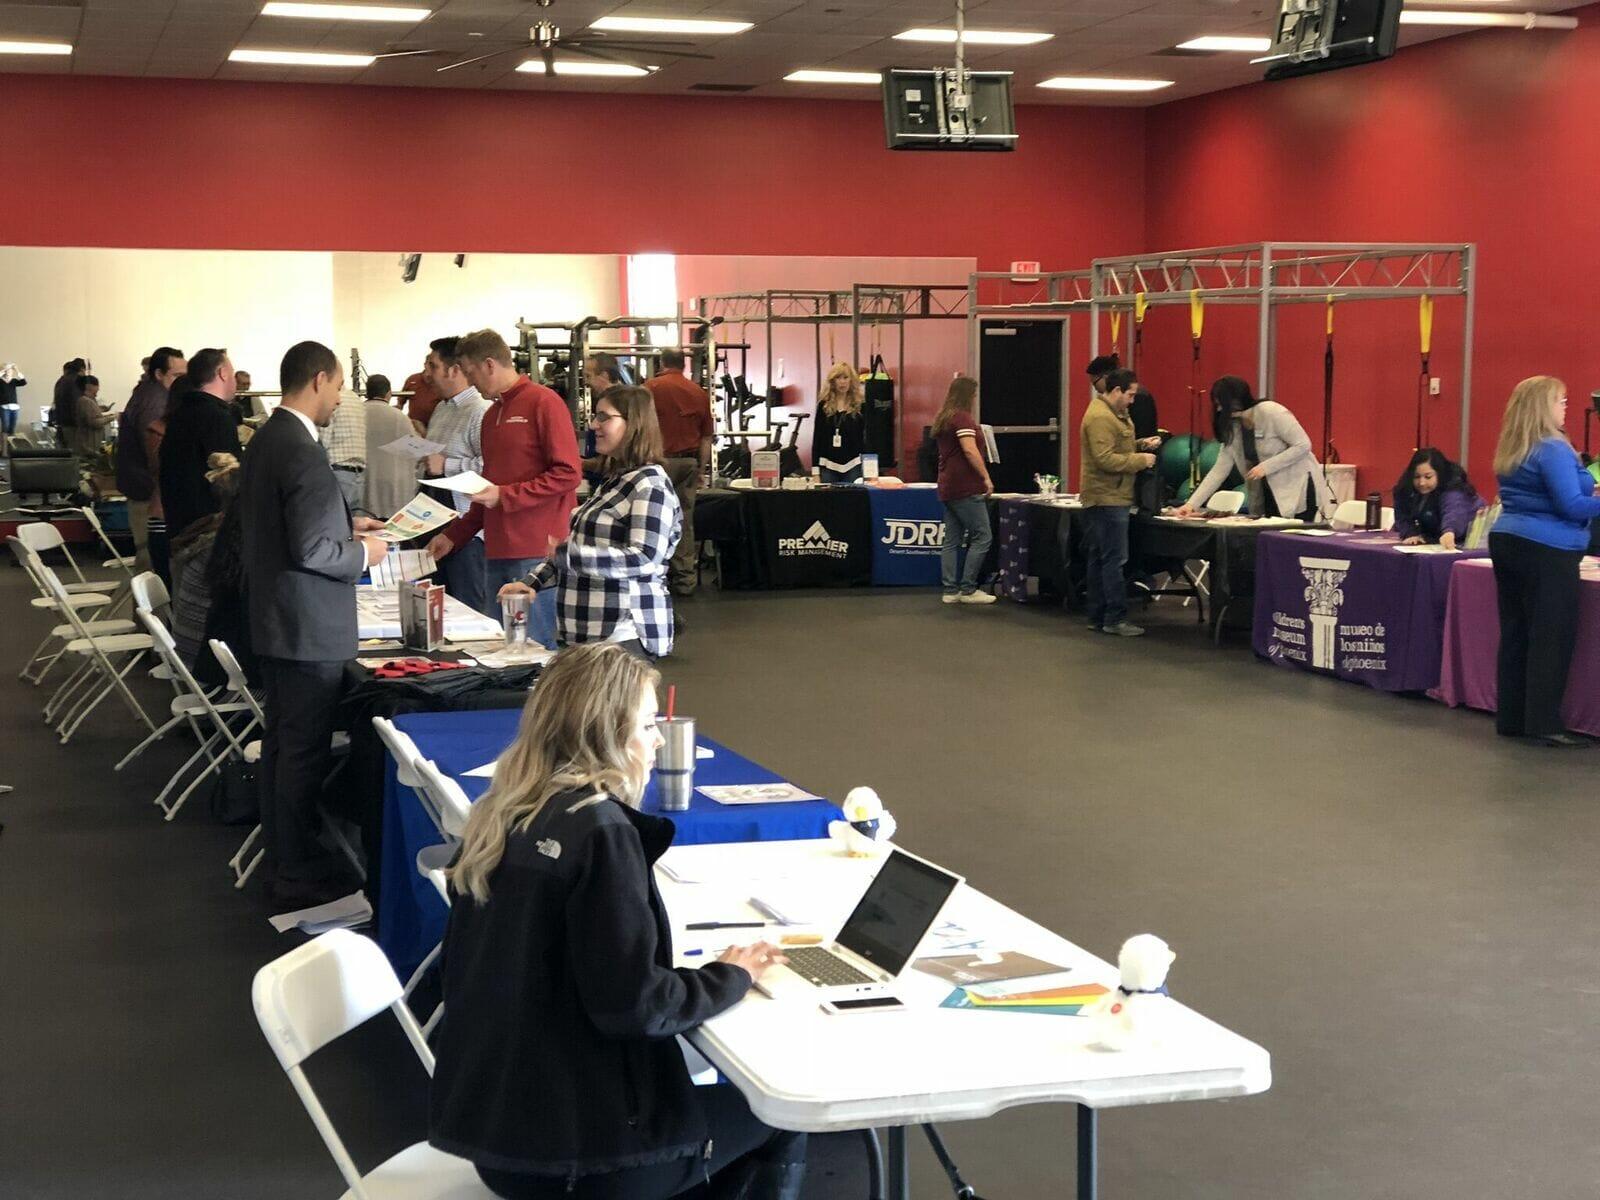 Caliente Construction 2019 Health Fair